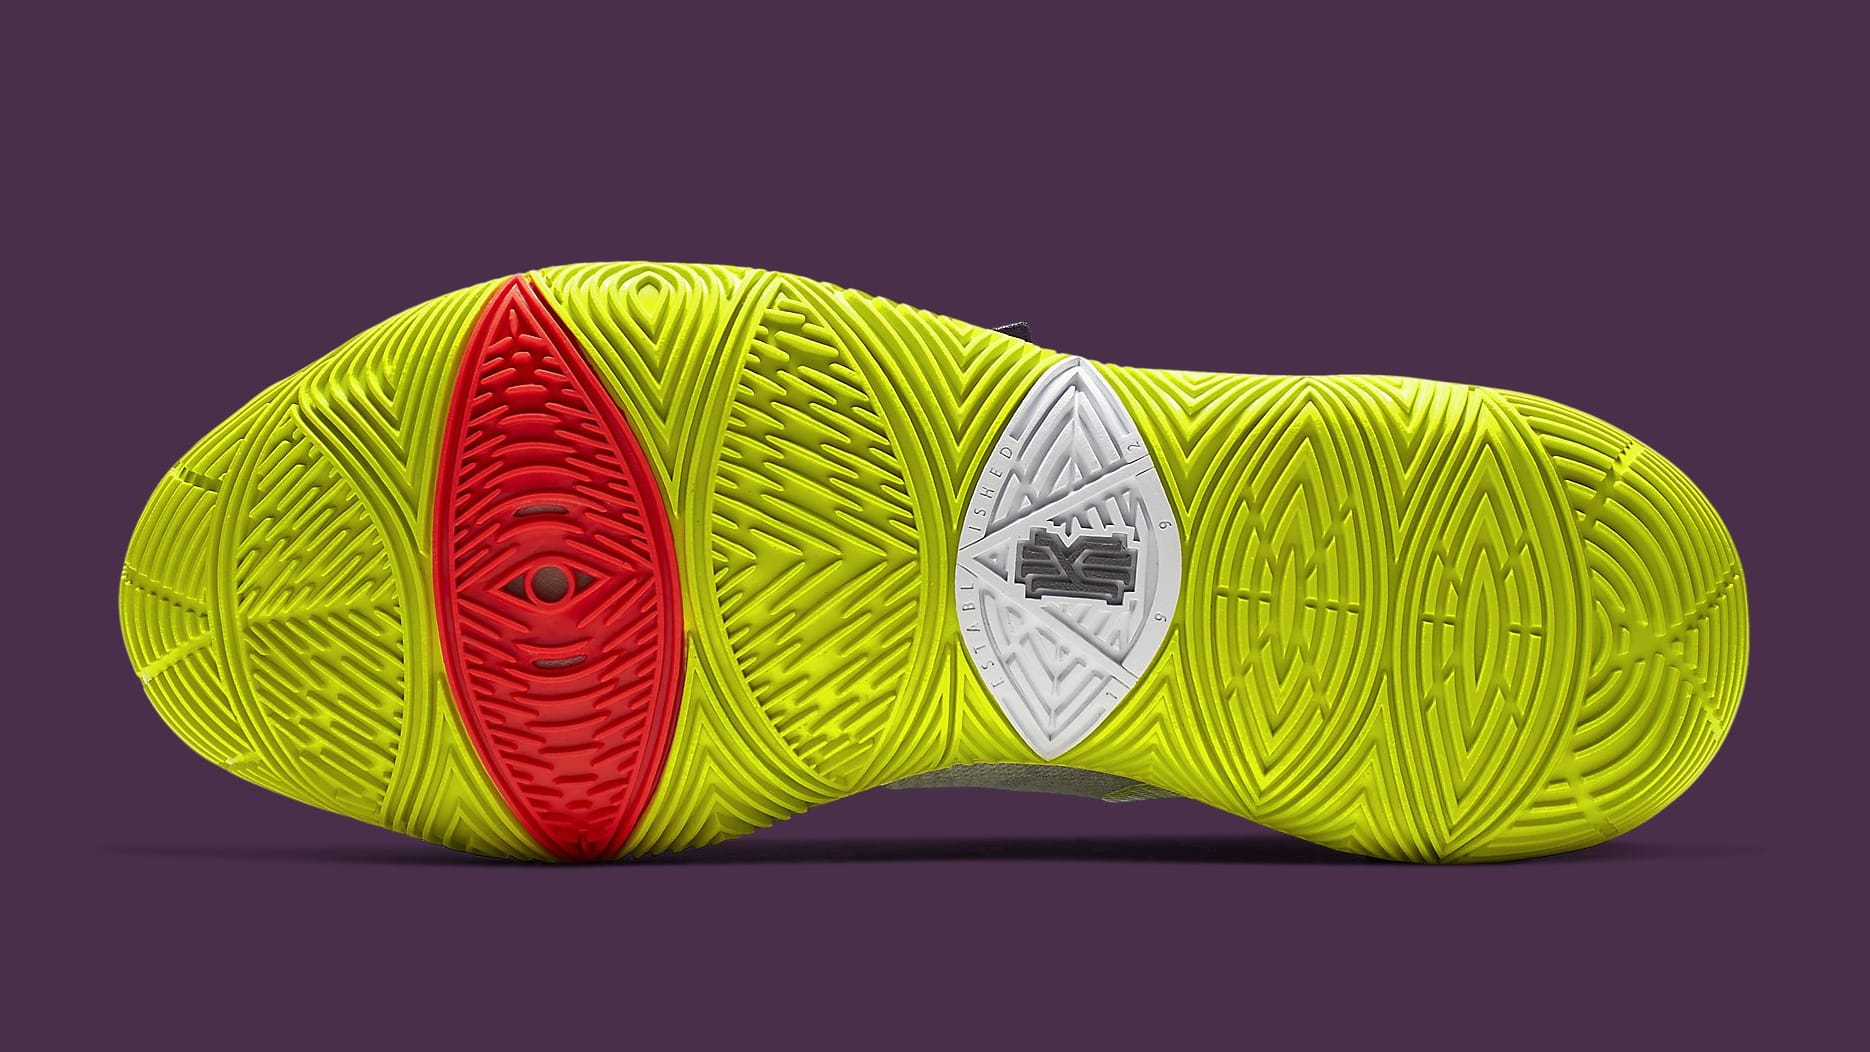 Nike Kyrie 5 Chaos Mamba Mentality Release Date AO2918-102 Sole